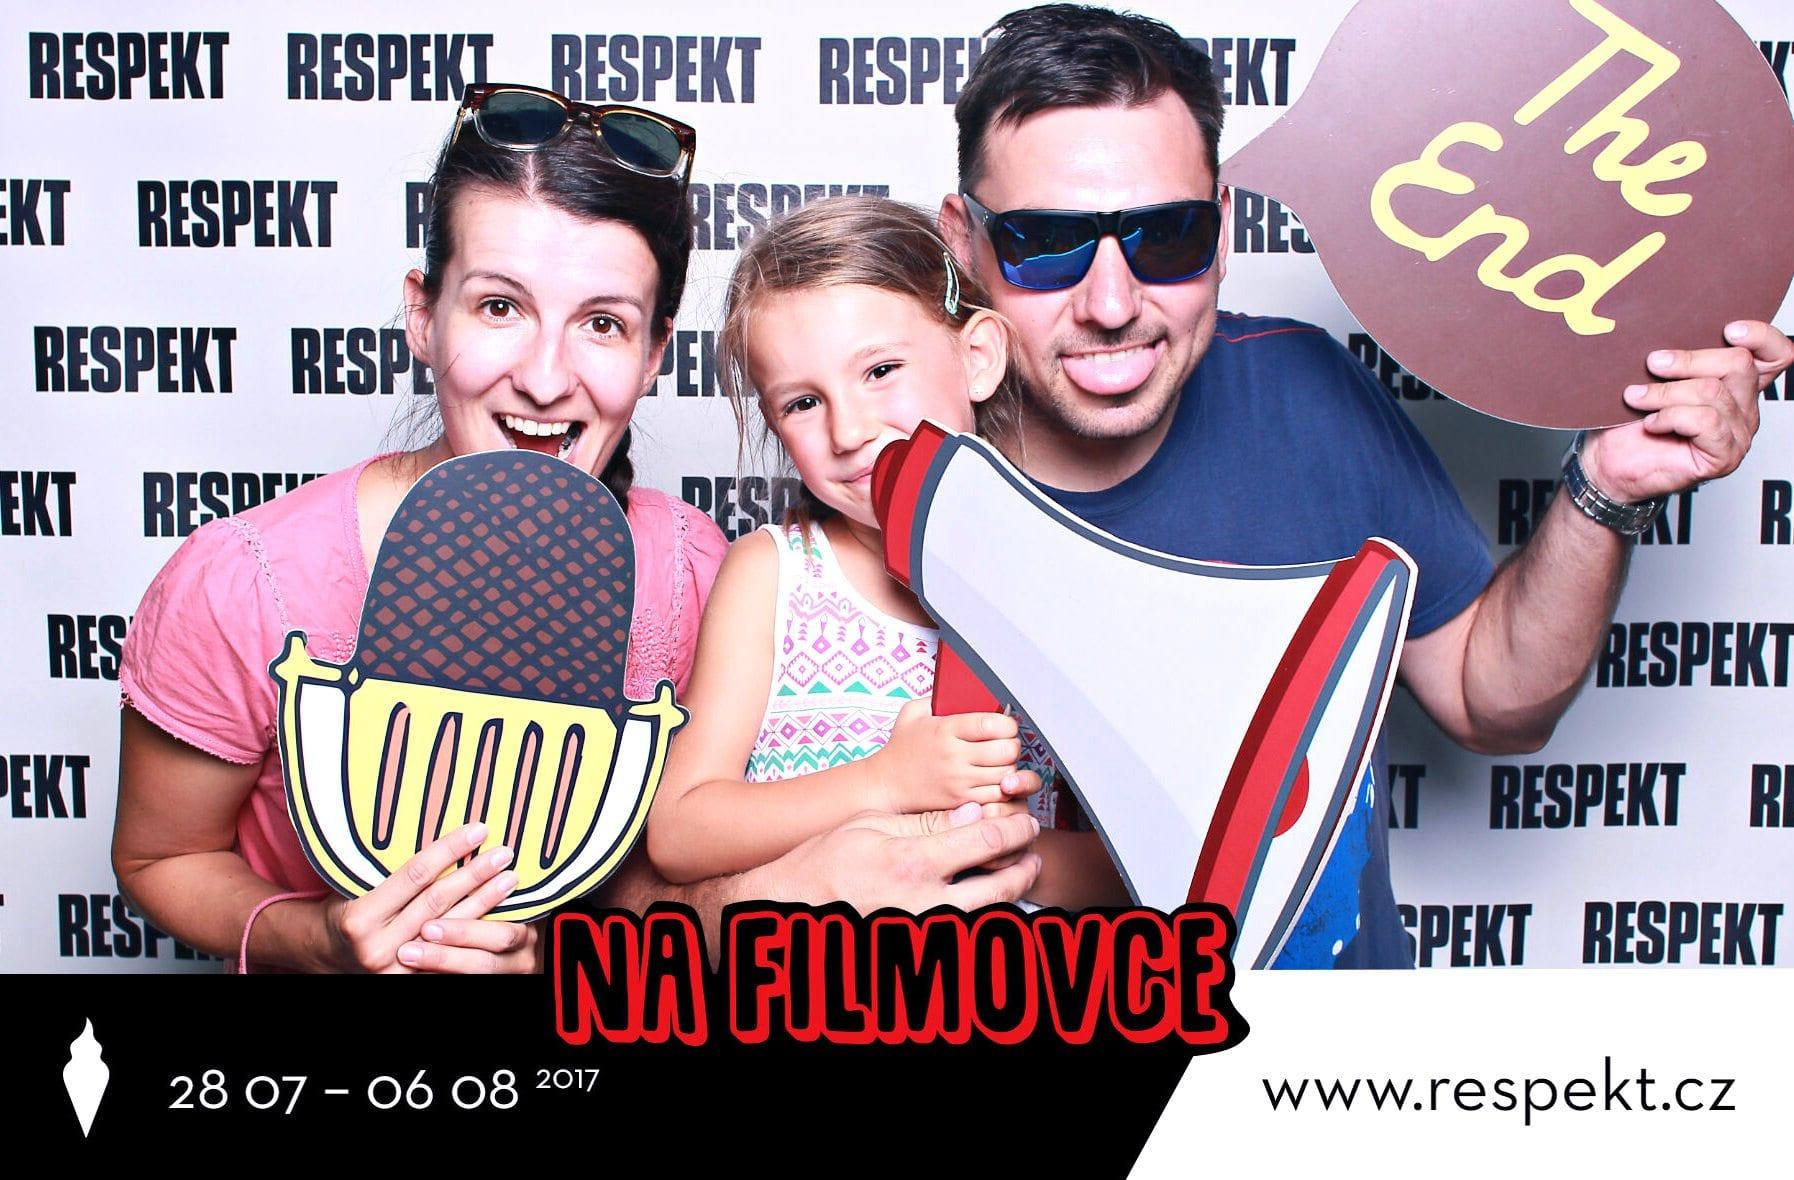 fotokoutek-respekt-na-filmovce-31-7-2017-290745